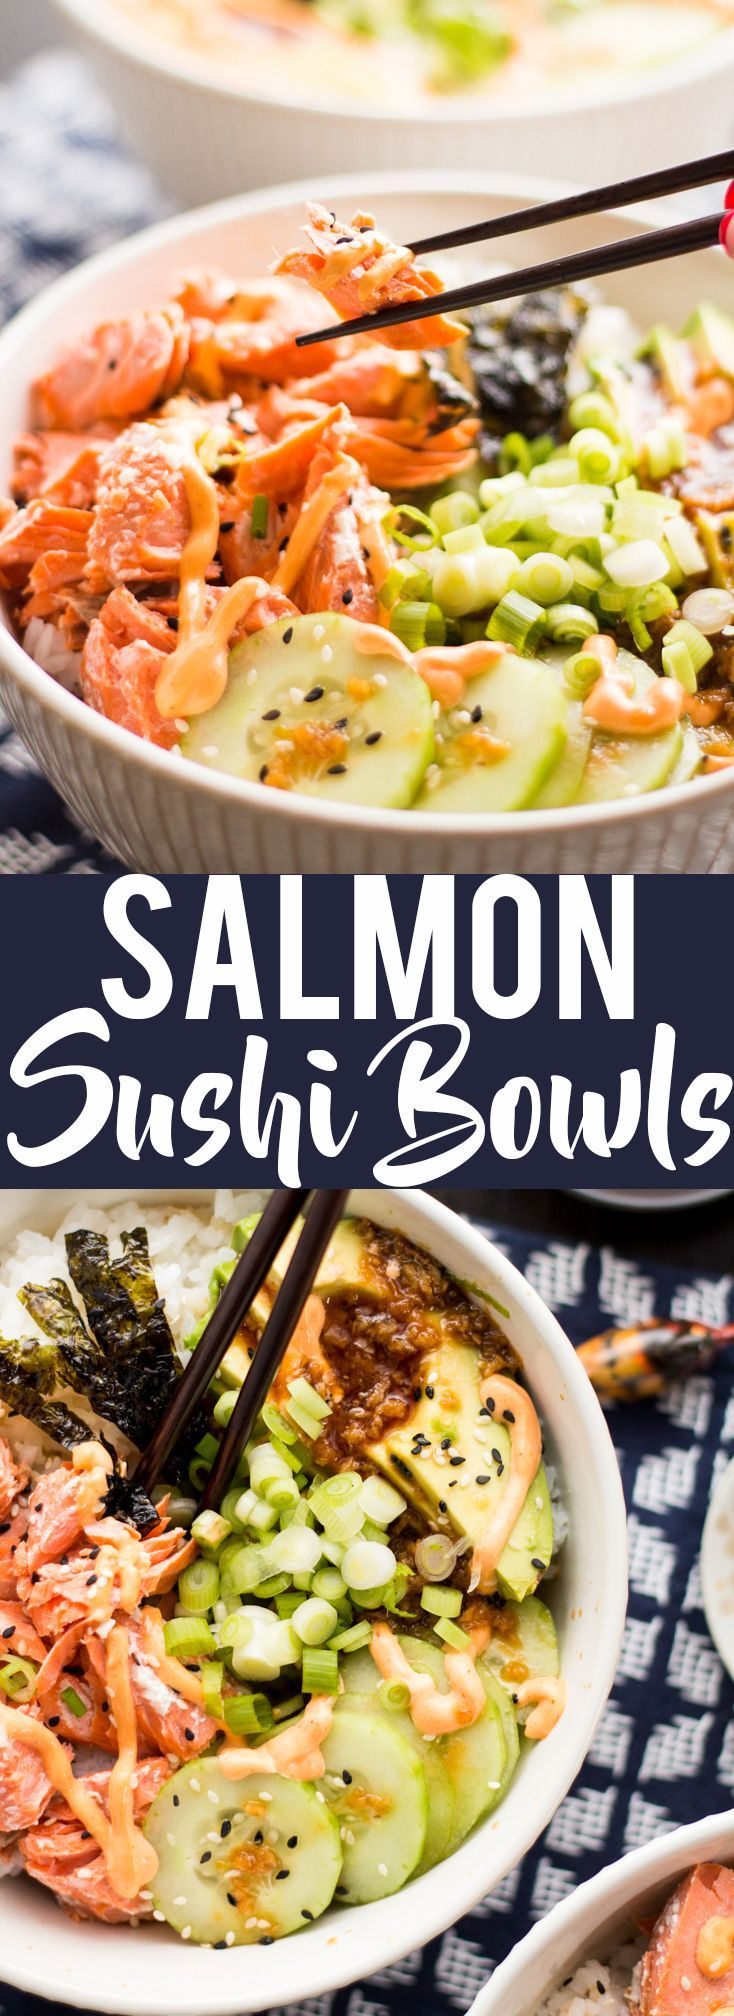 Salmon Recipes | Sushi | Sushi Bowls #ad